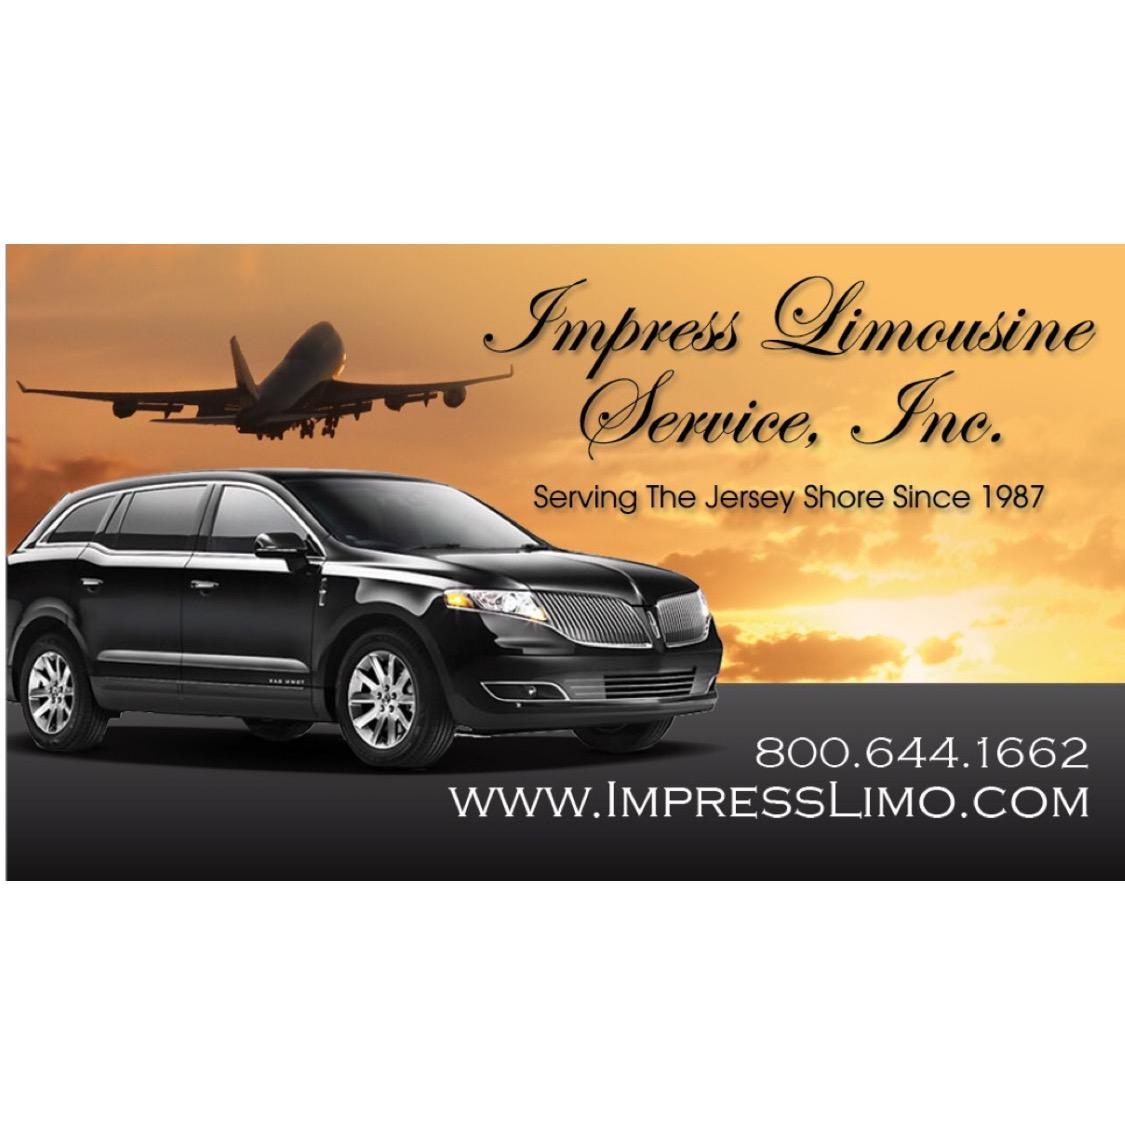 Impress Limousine Service